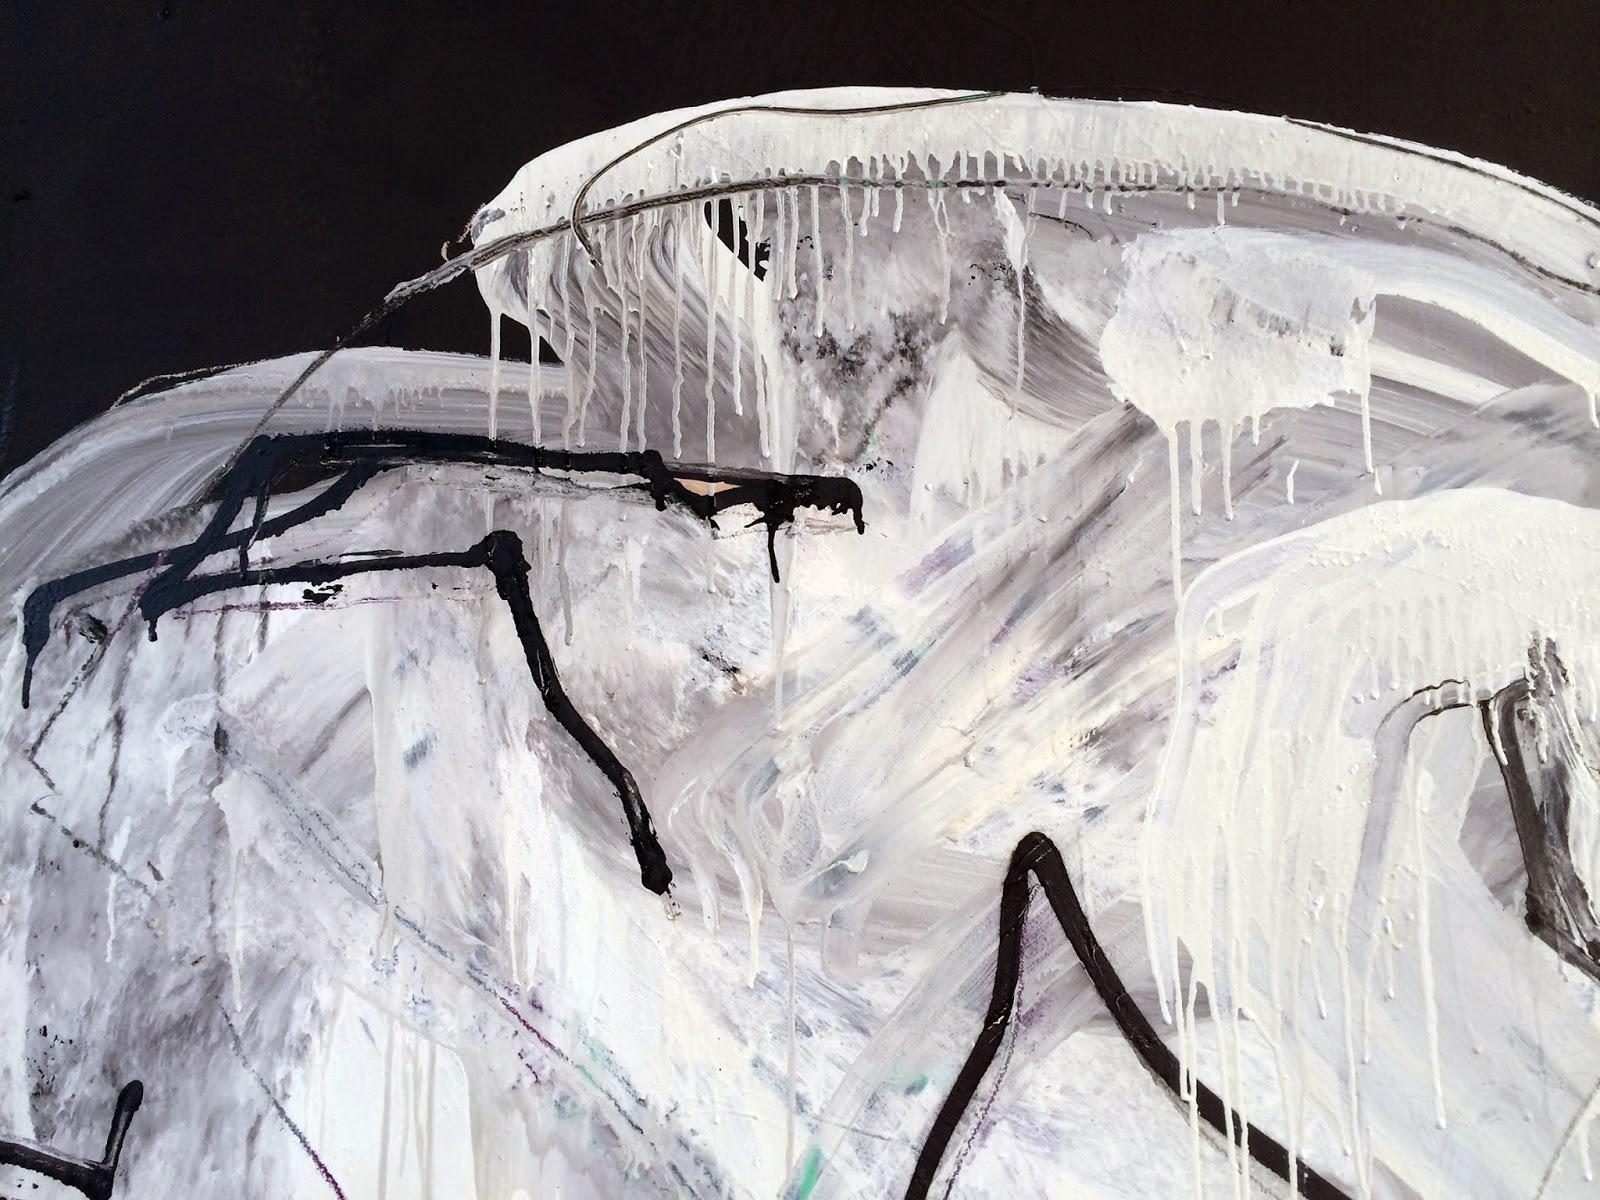 abik-the-f-new-mural-02